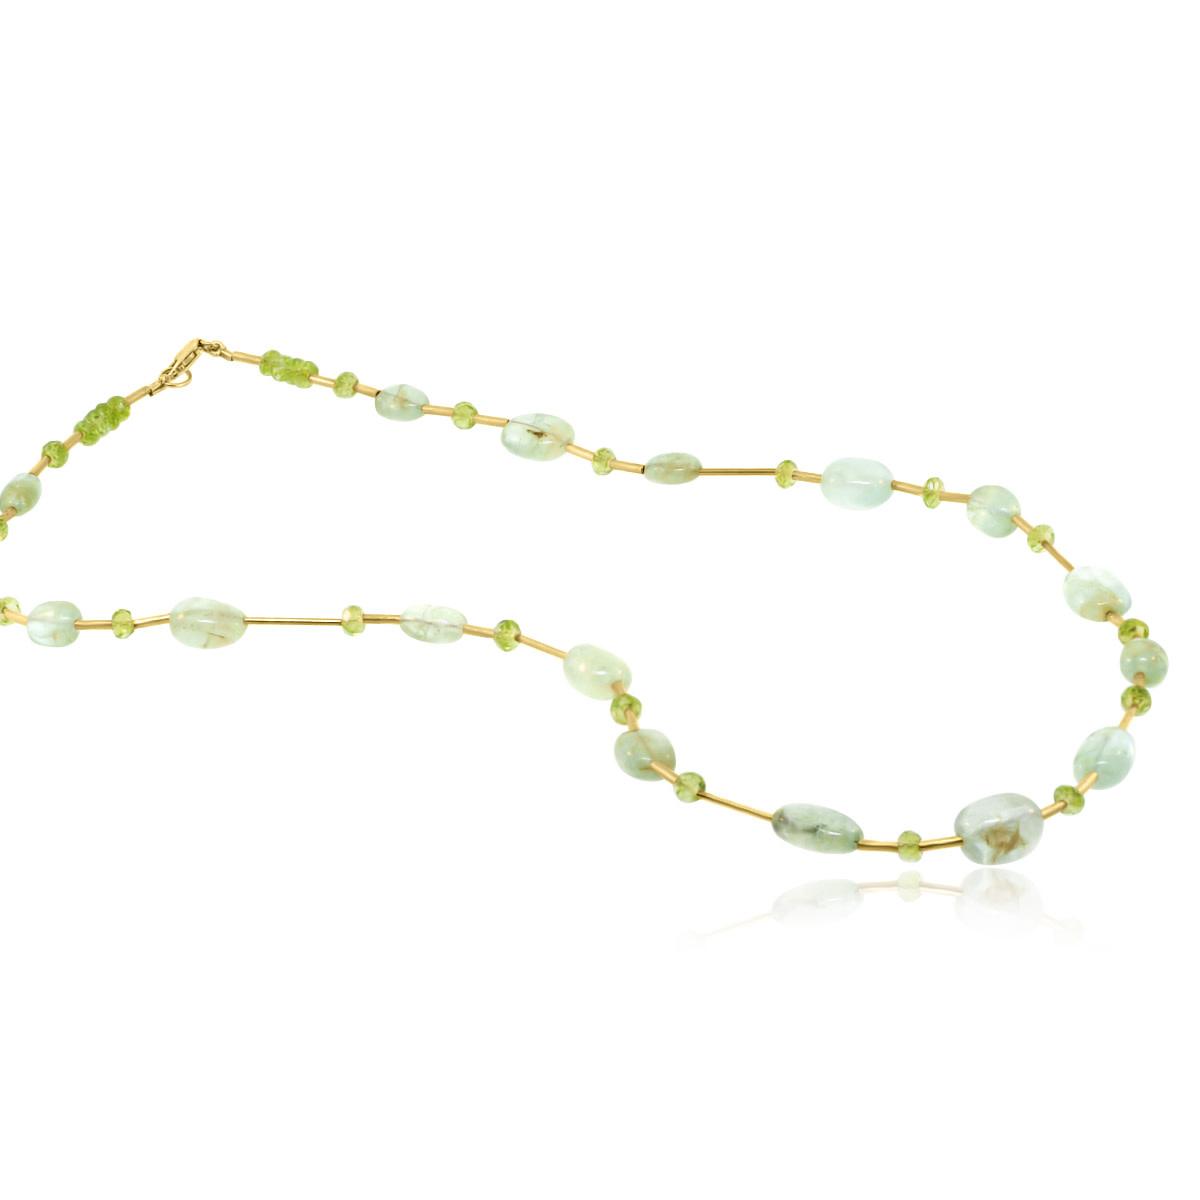 Trabert Goldsmiths Prehnite and Peridot Beaded Necklace